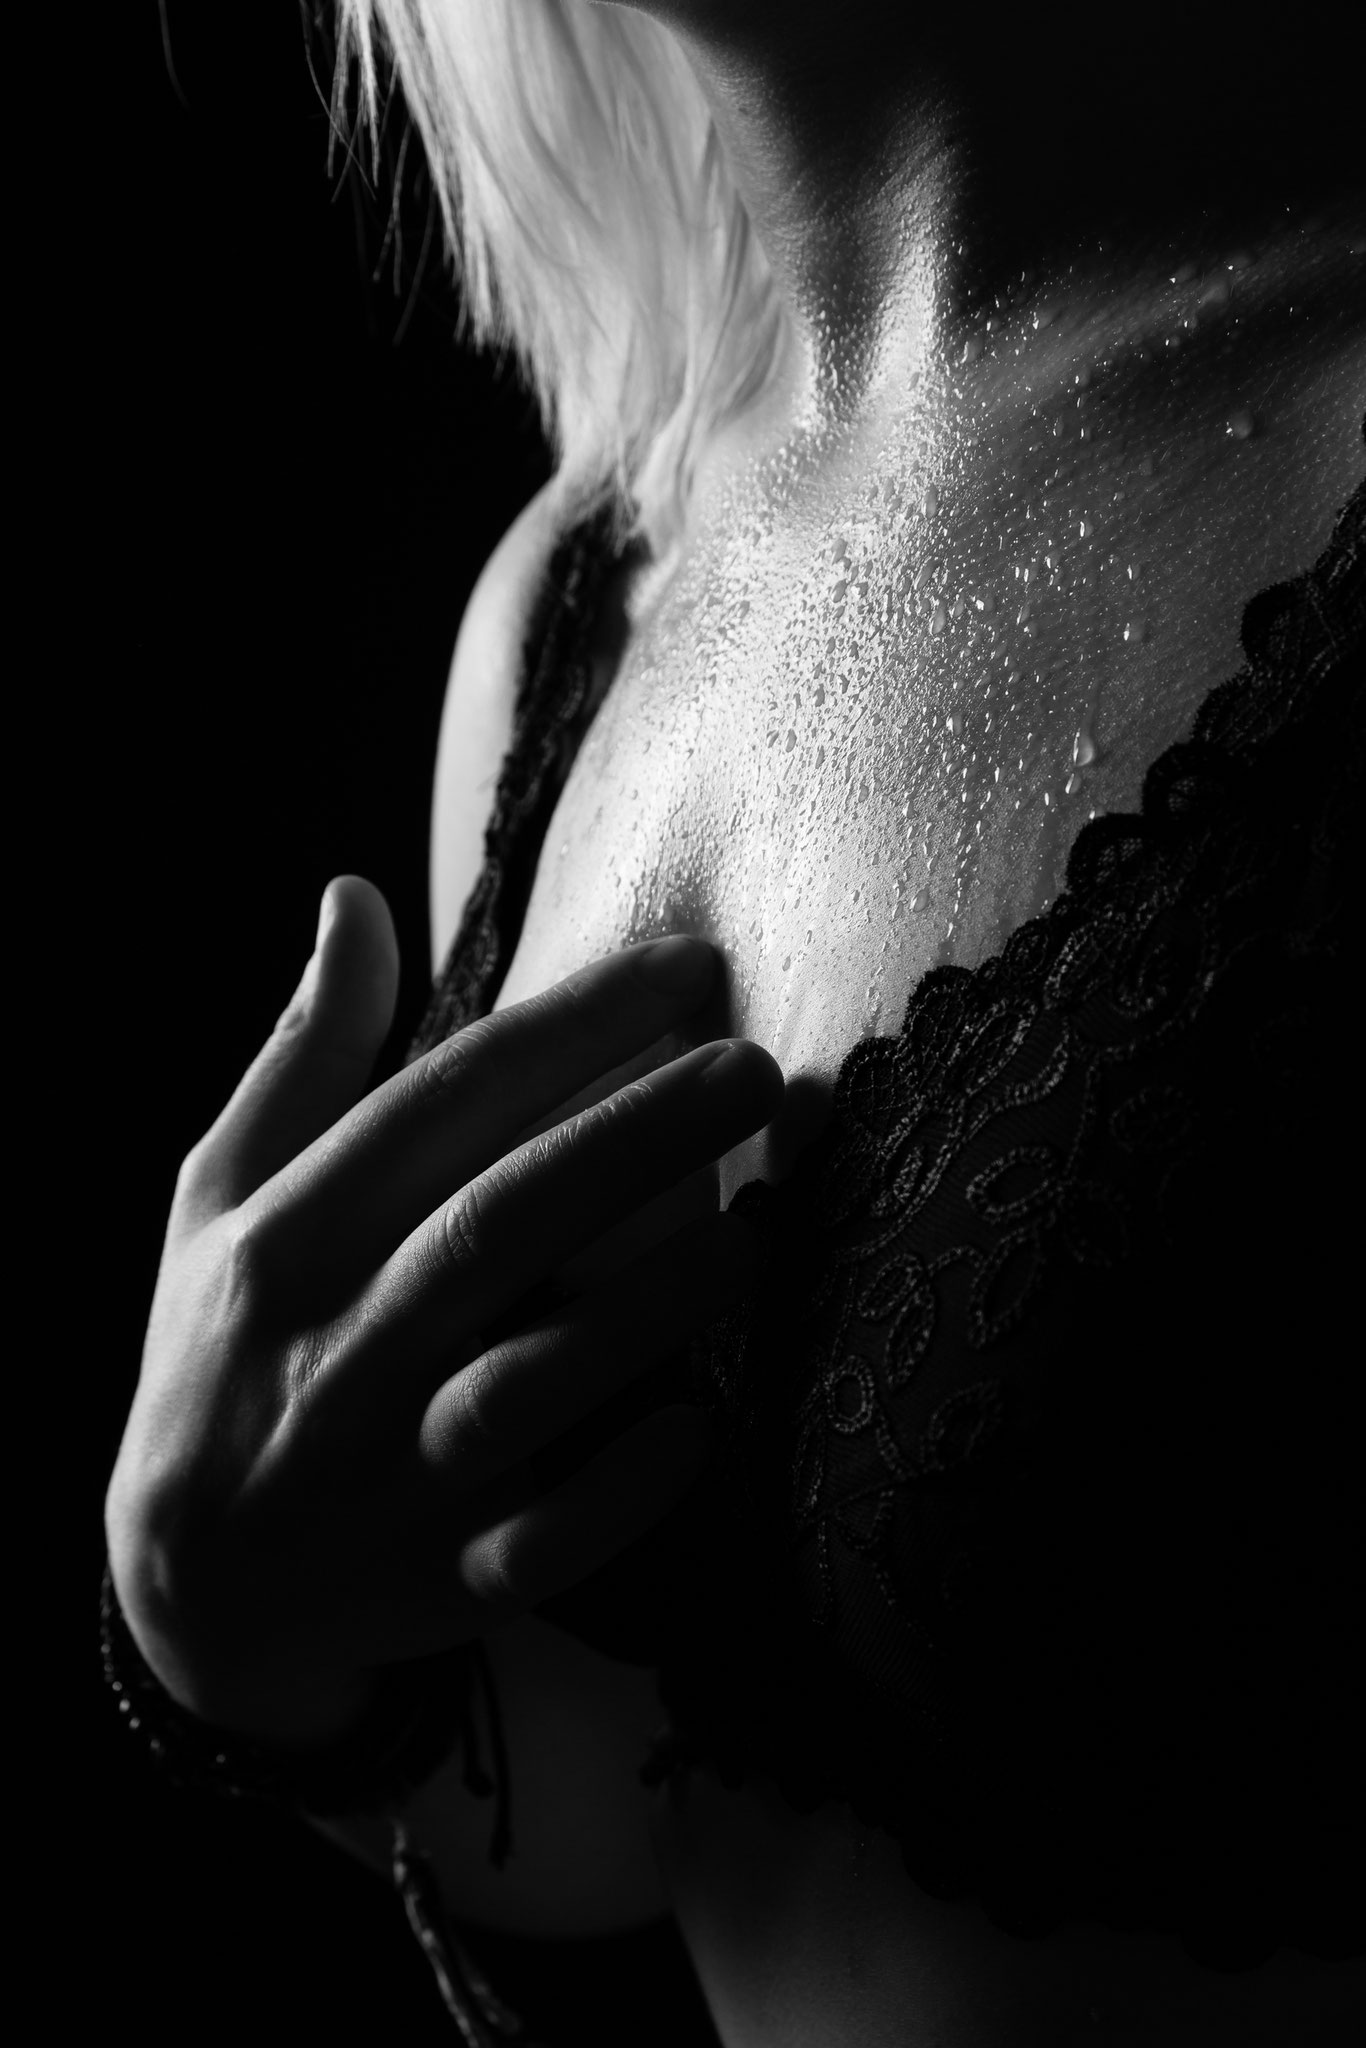 Feuchte wet erotic Photography beim nude-art-photographer aus Erlangen